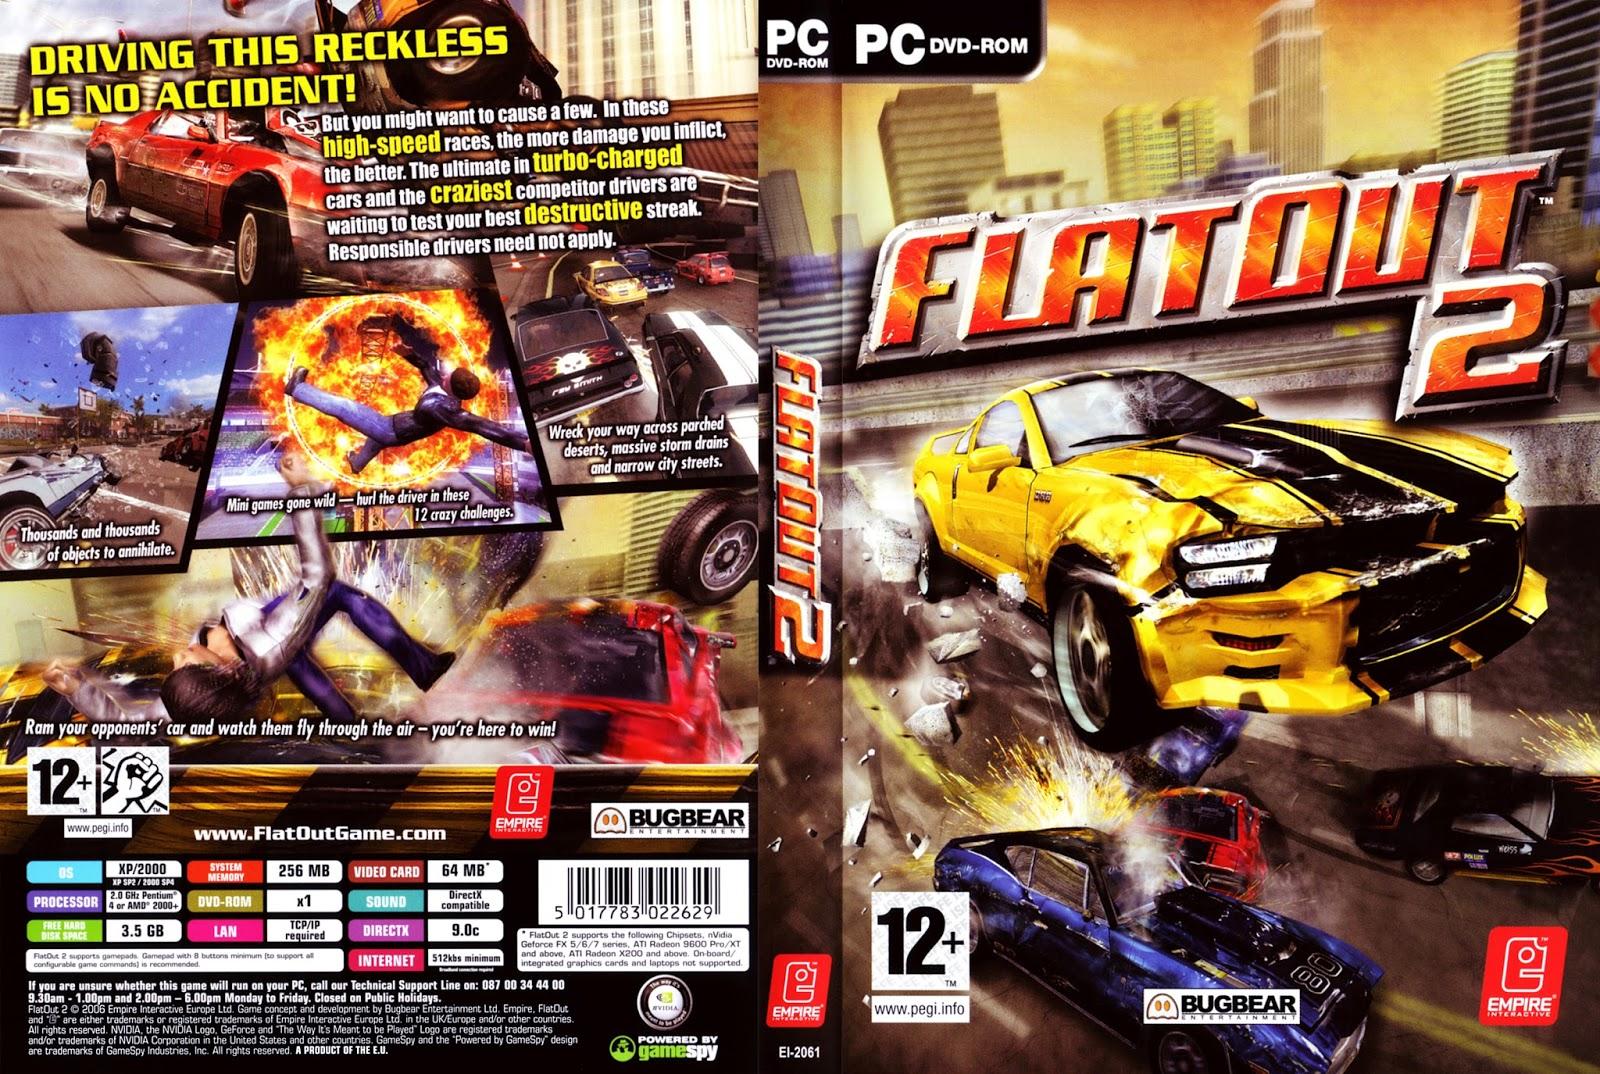 flatout 2 download gratis completo